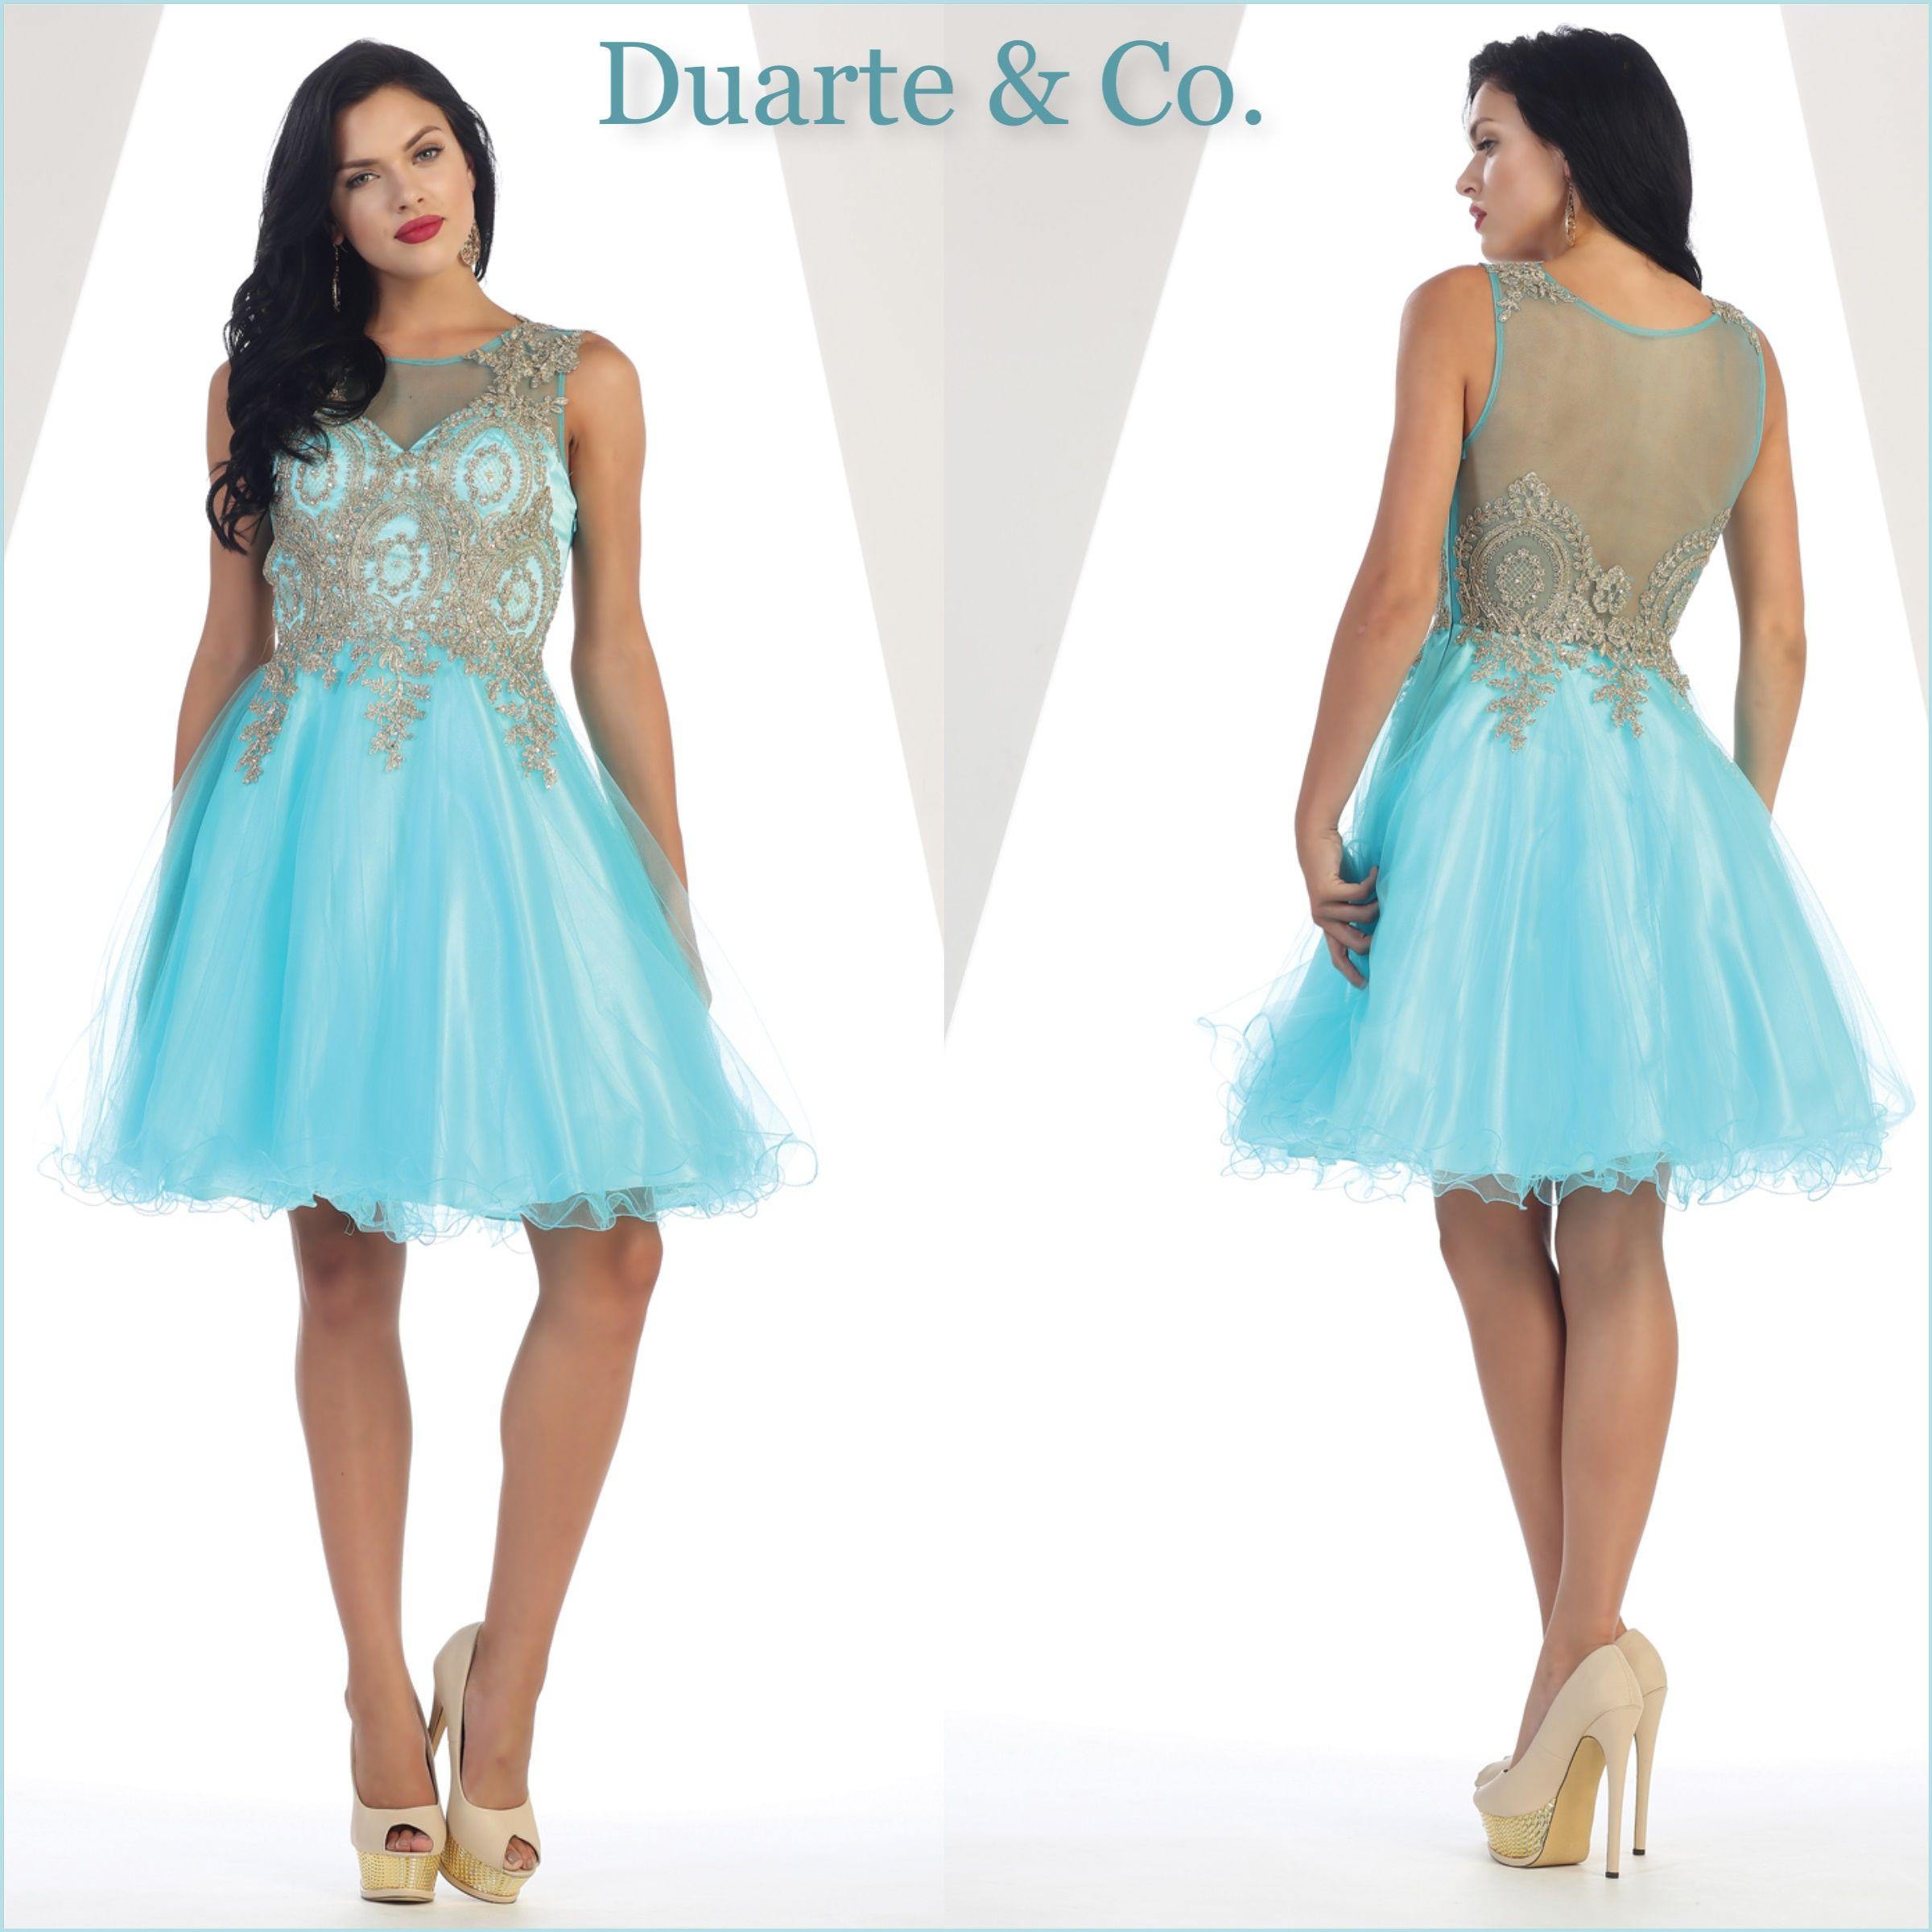 Perfect Jasper Conran Wedding Dress Motif - Womens Dresses & Gowns ...